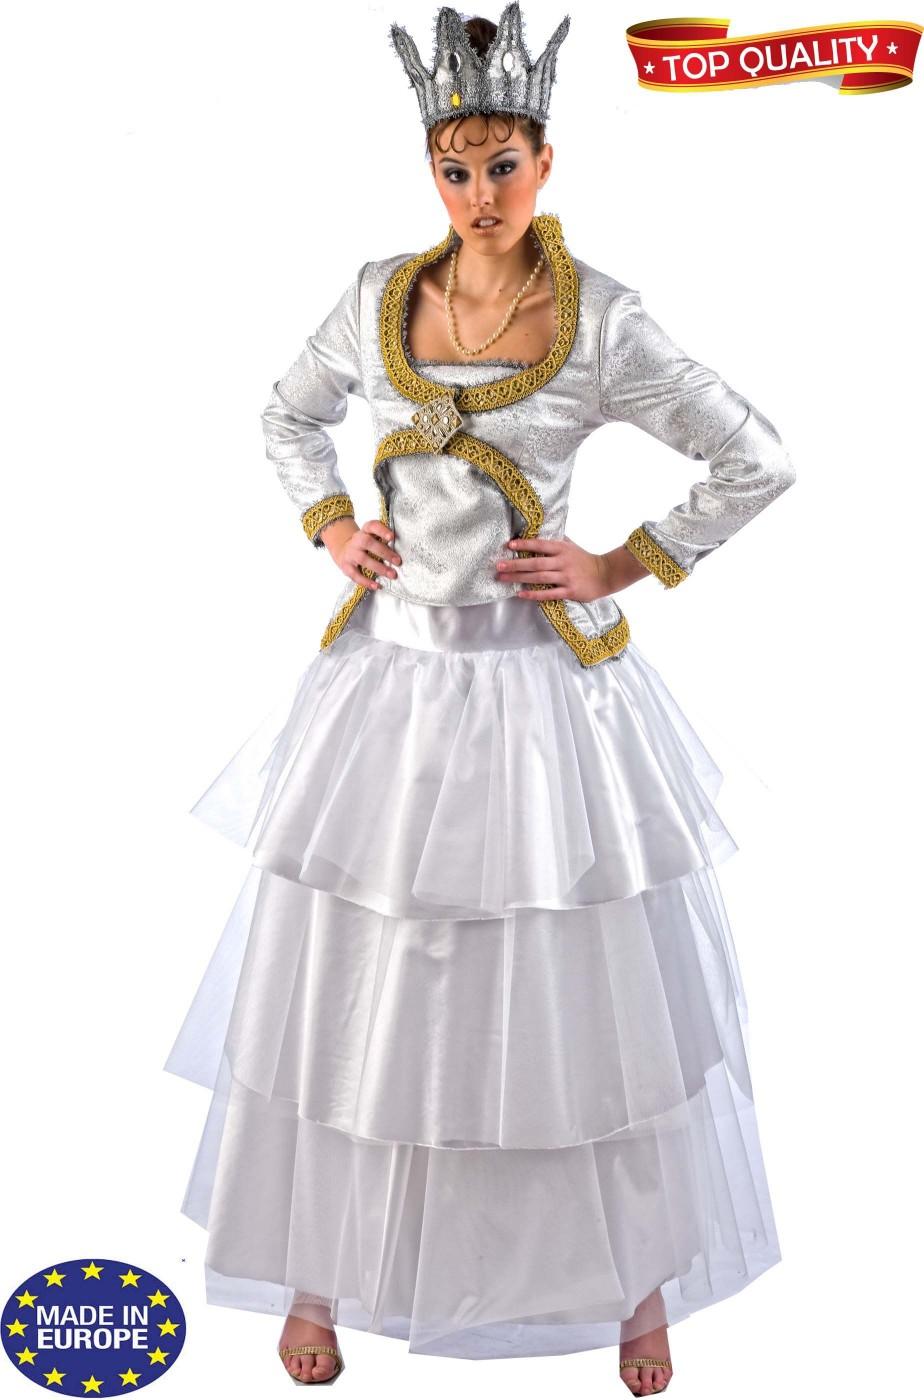 Costume di carnevale teatrale Regina Bianca Alice in Wonderland Top Quality